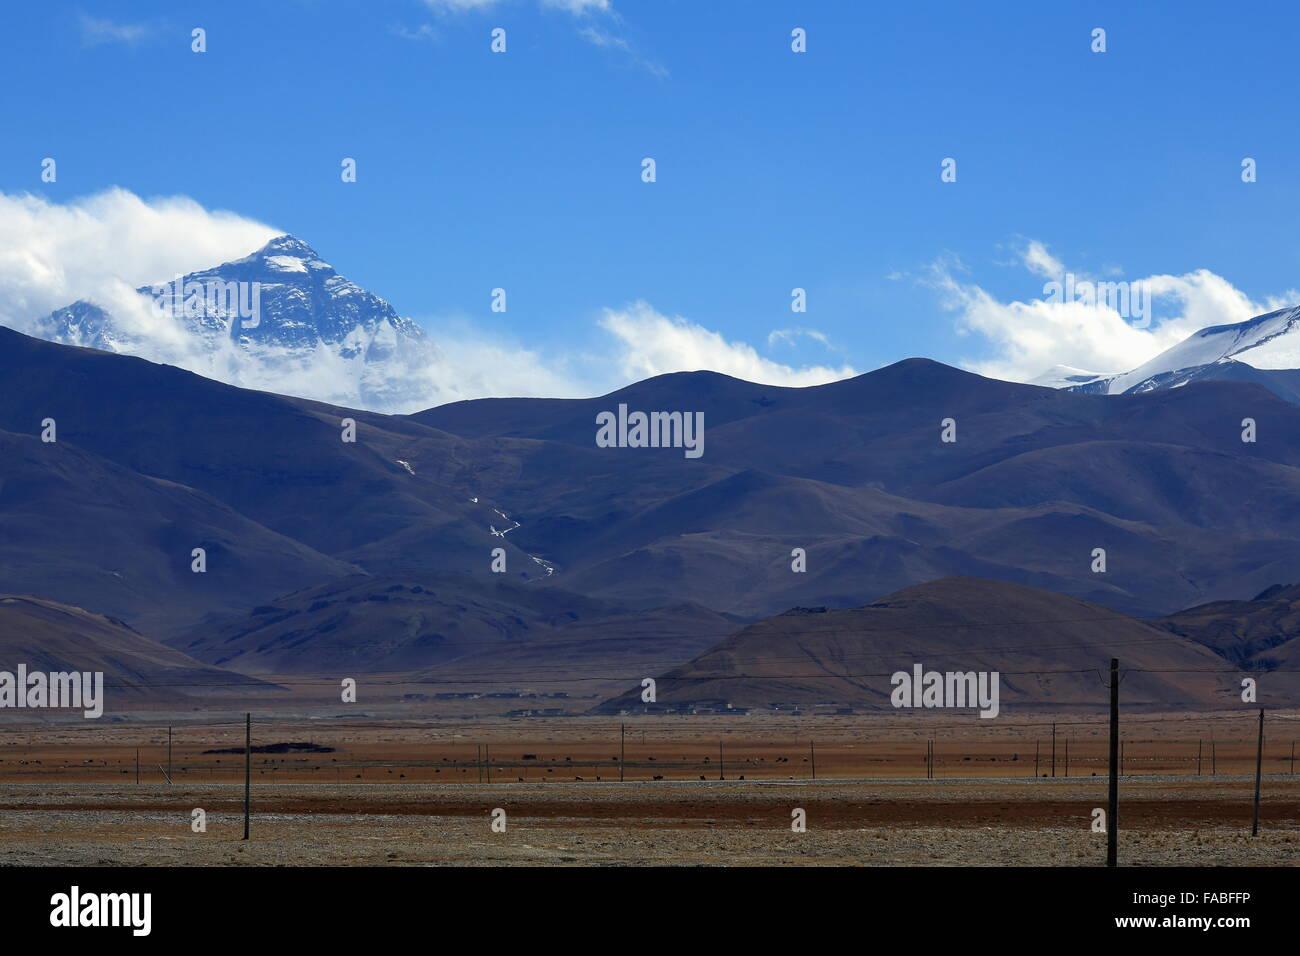 Mount Chomolungma-Qomolangma-Sagarmatha-Holy Mother-Everest north face. From the tibetan plateau Tingri-Lawn Mountain - Stock Image